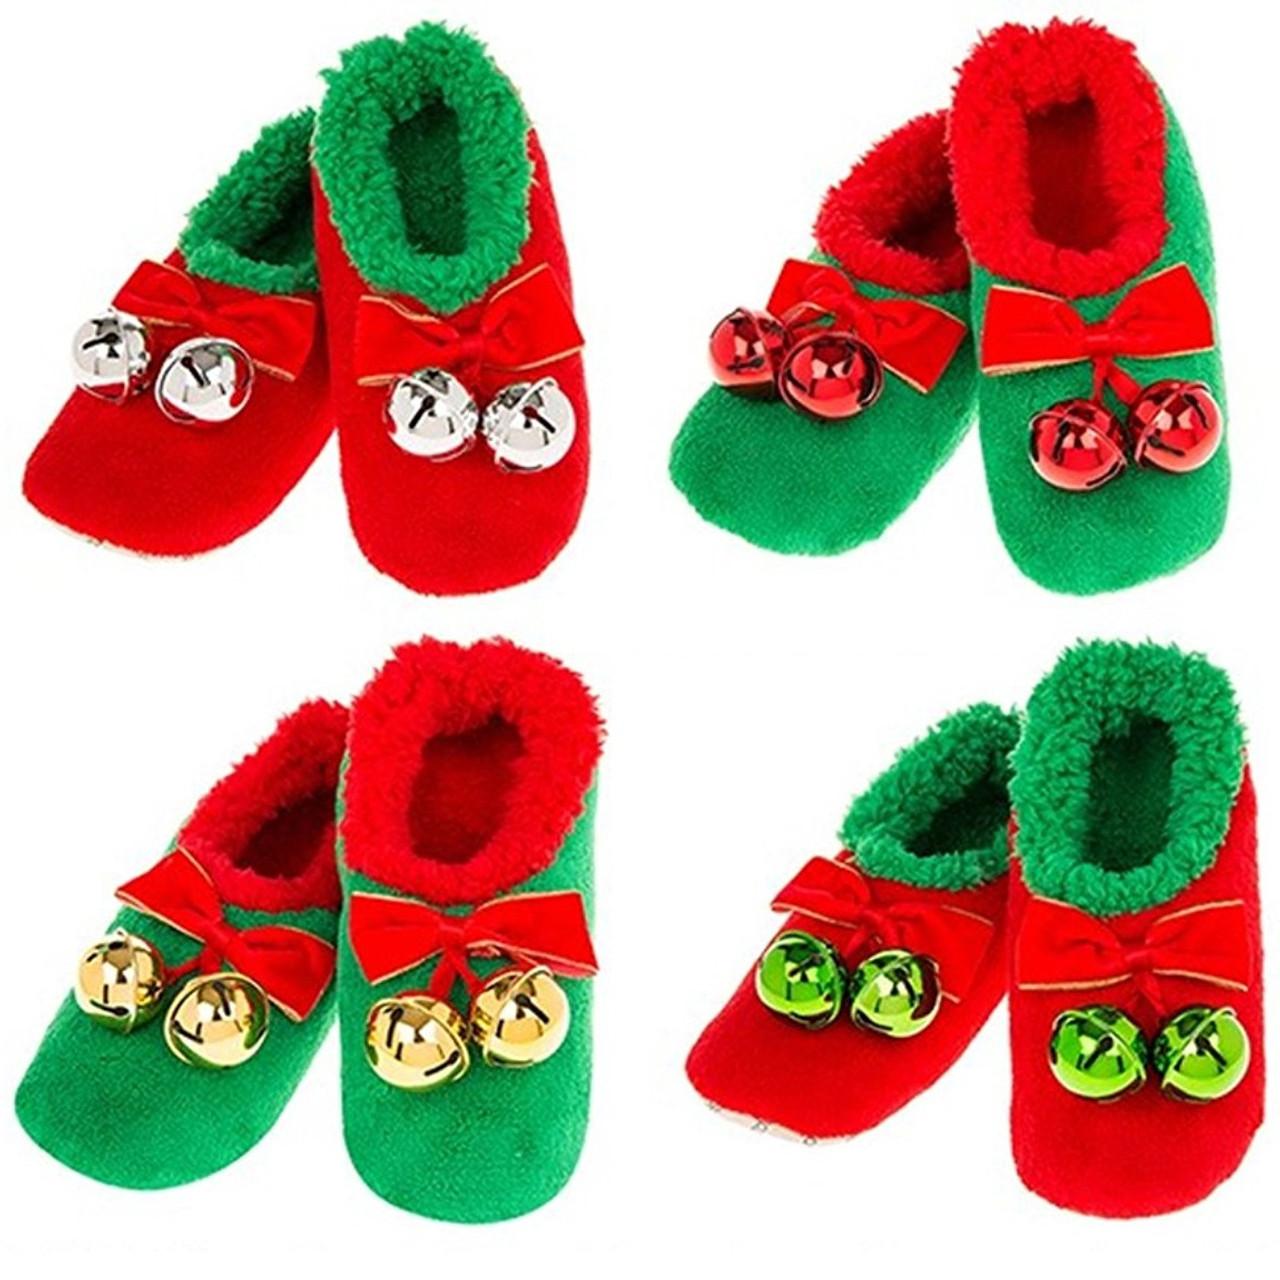 7fde999c6f9 Sleigh Bell Snoozies - Women s Christmas Slippers - RetroFestive.ca